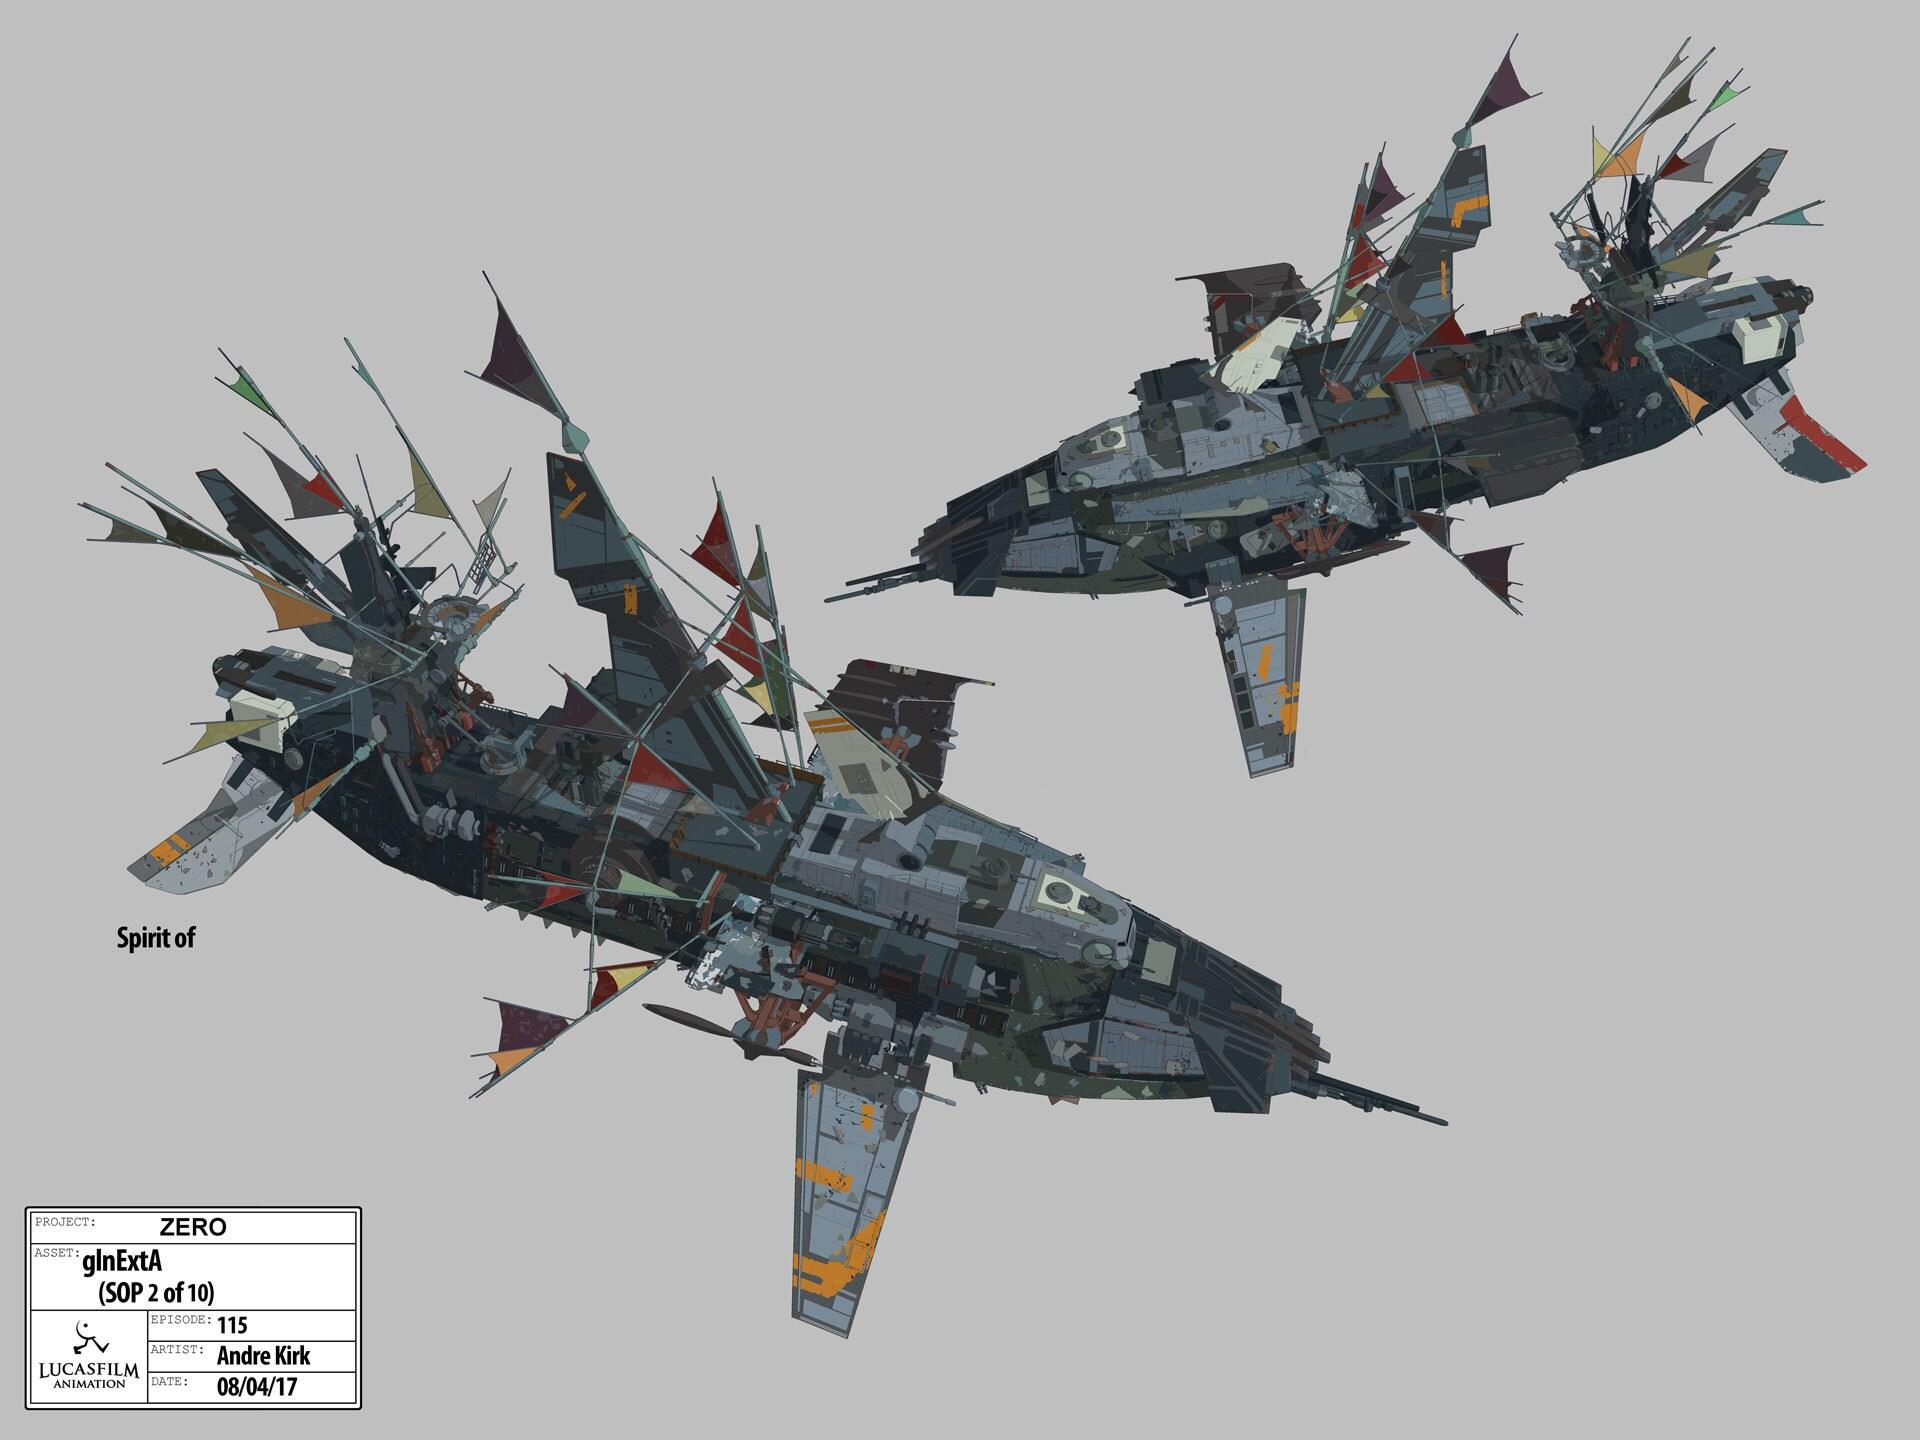 resistance-115-concept-art-gallery-5_f889115a.jpeg?region=0%2C0%2C1920%2C1440